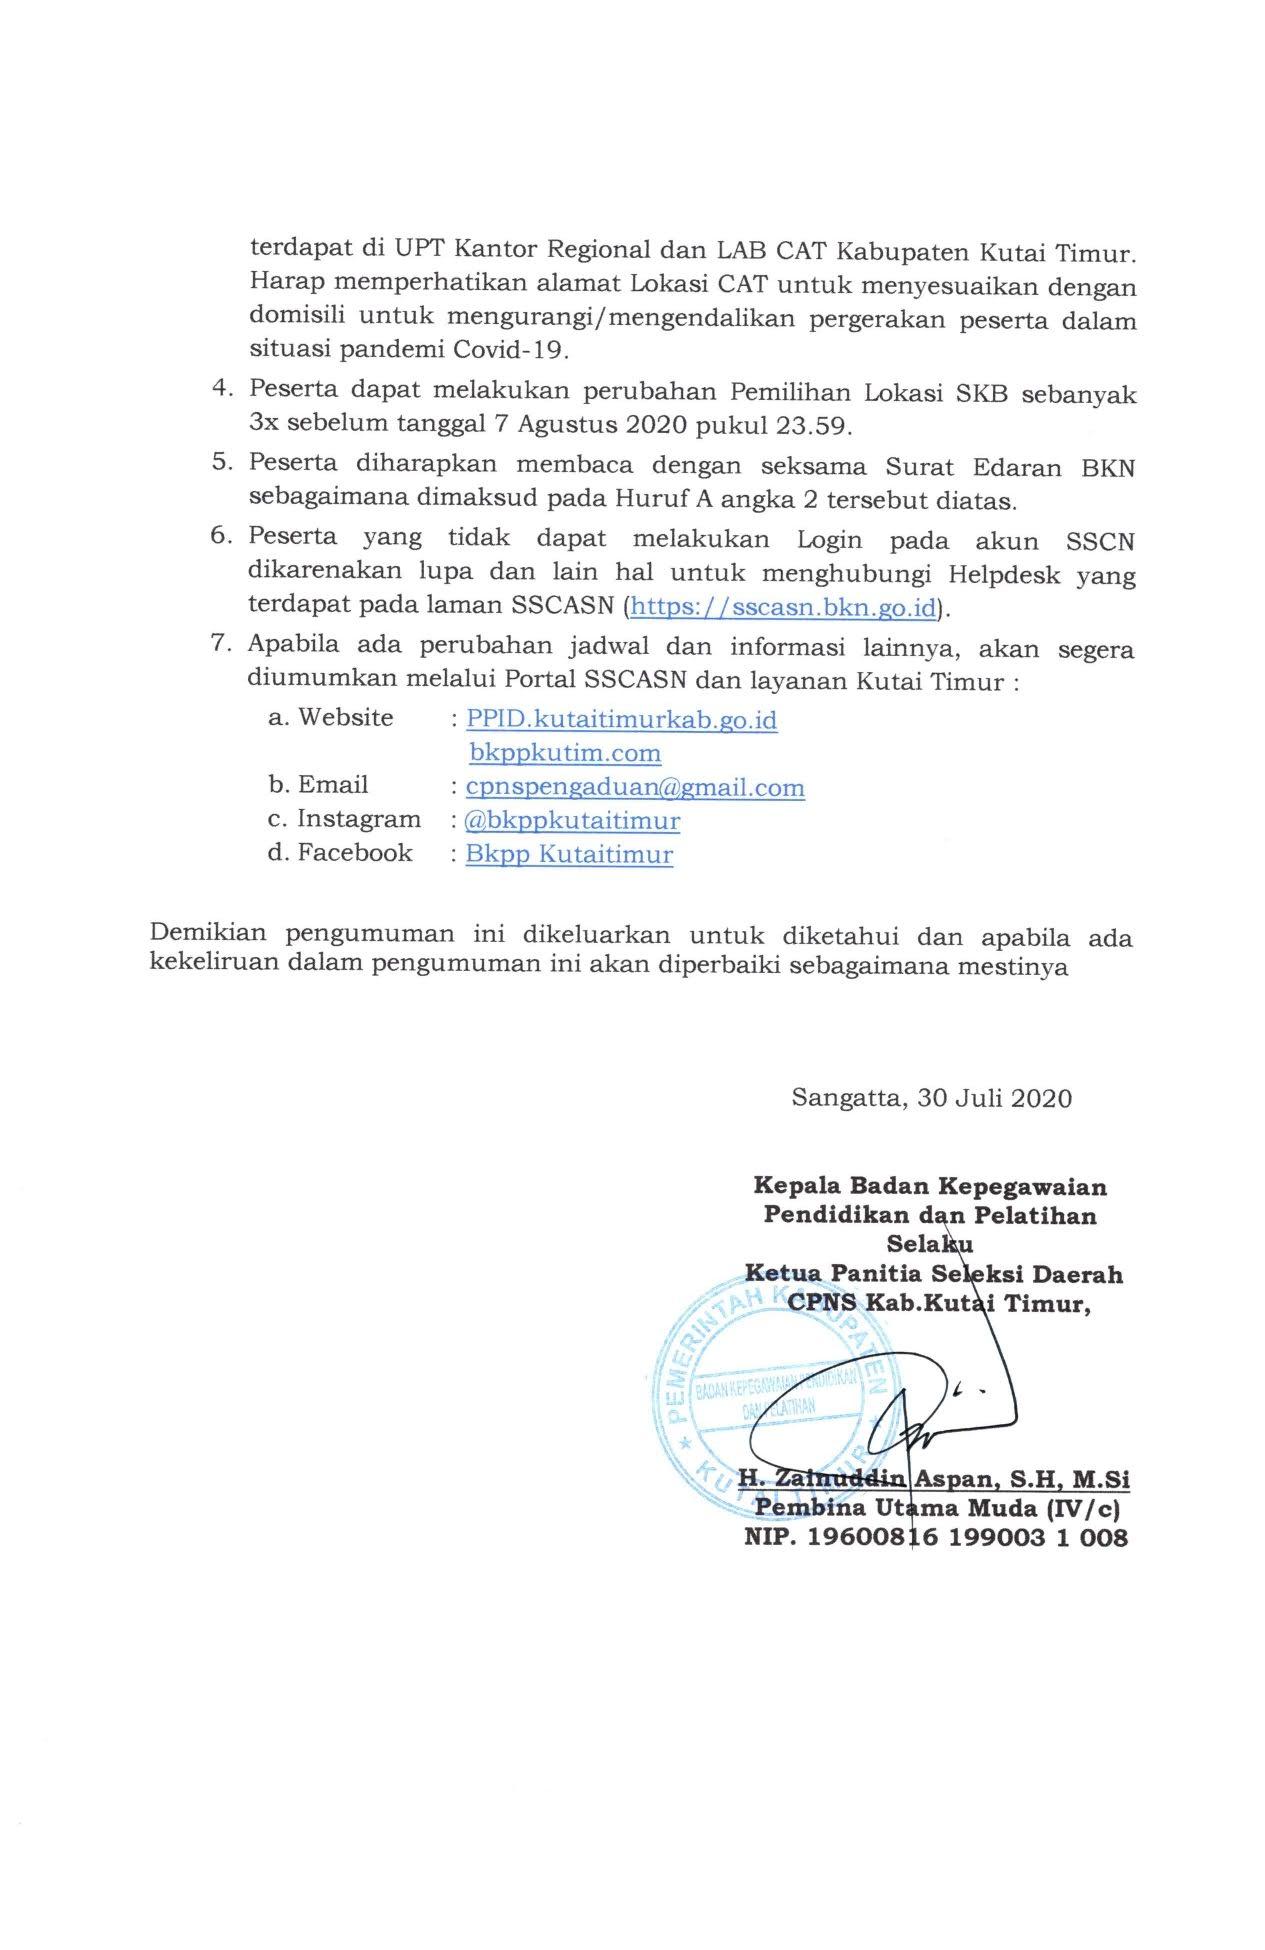 Persiapan Pelaksanaan SKB CPNS 2020